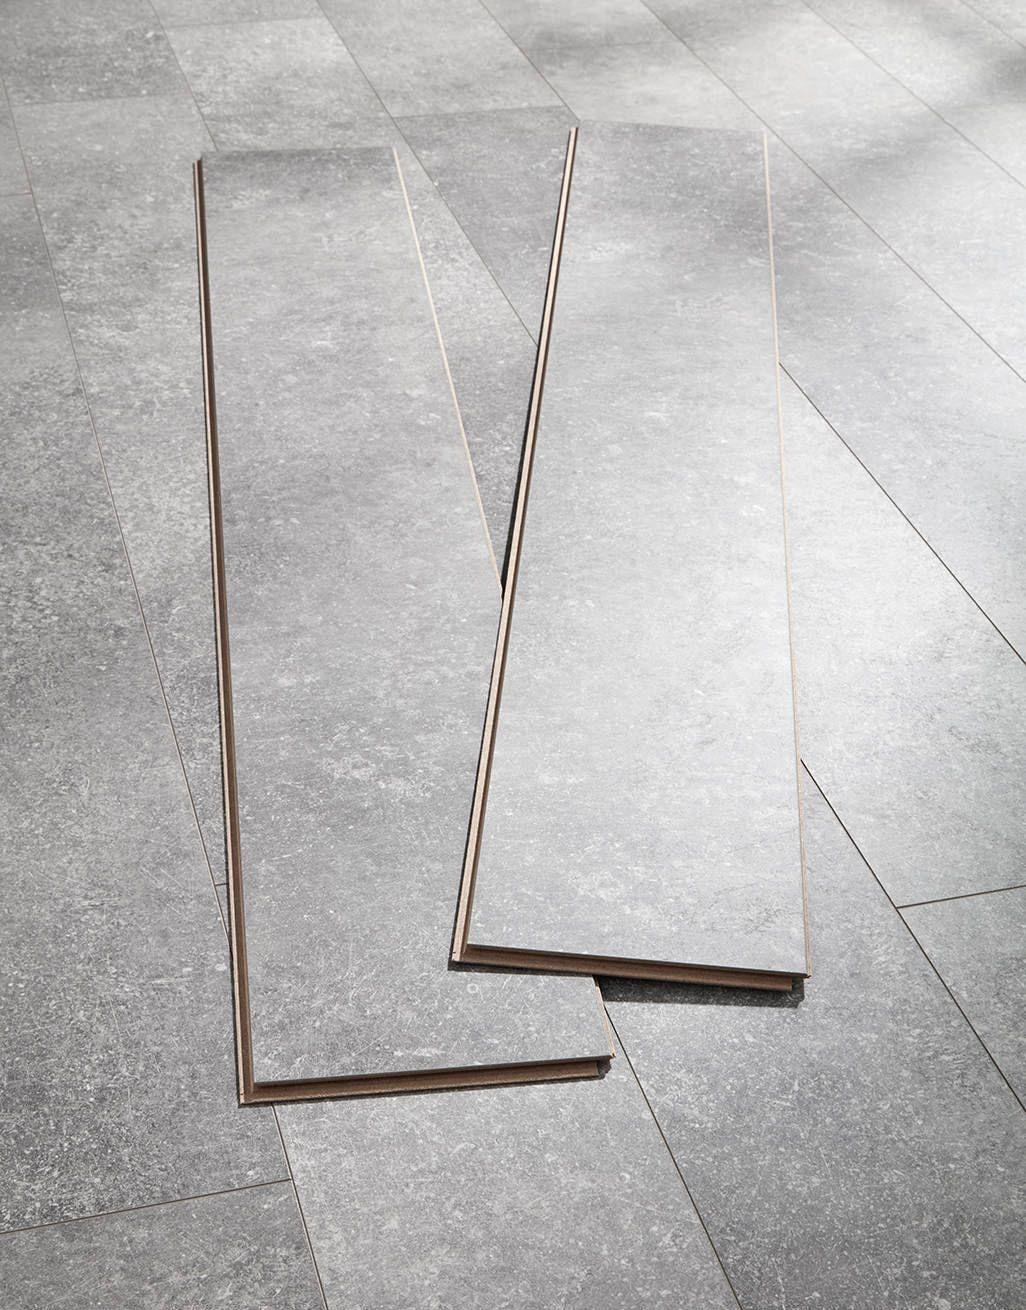 Valencia Tile Weathered Grey Laminate, Cement Effect Laminate Flooring